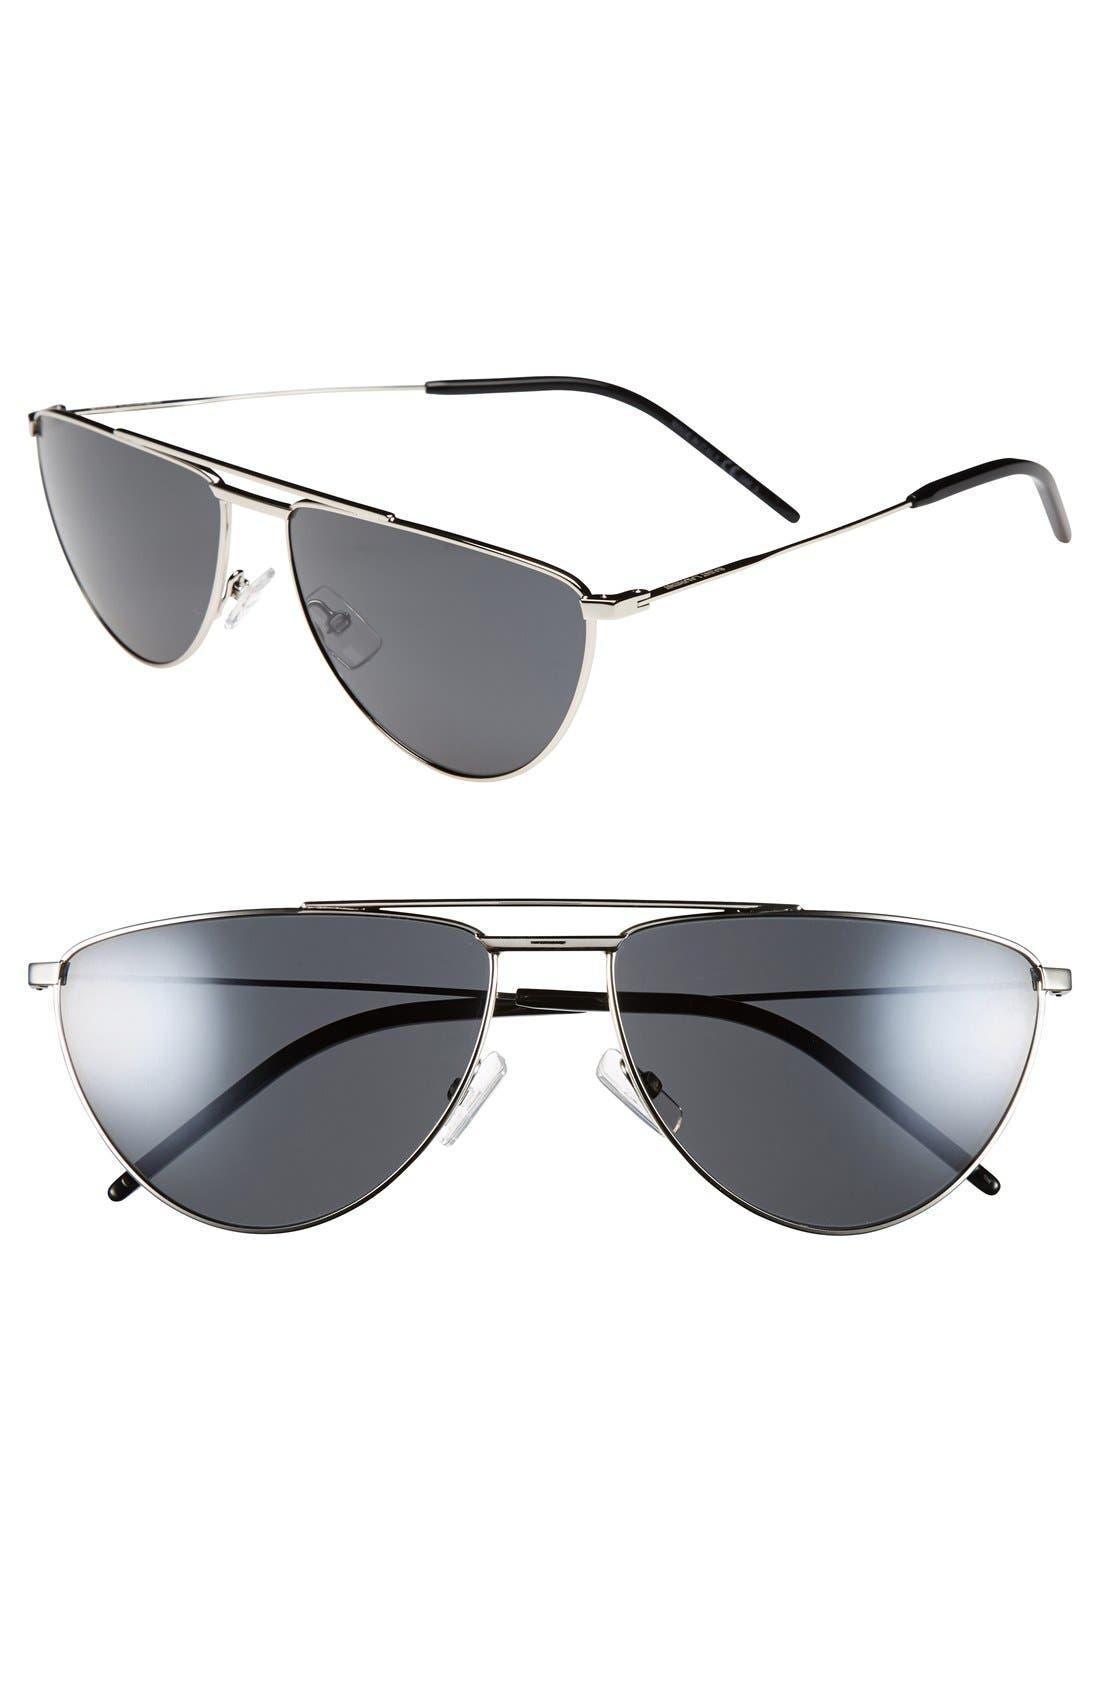 Alternate Image 1 Selected - Saint Laurent 59mm Retro Sunglasses